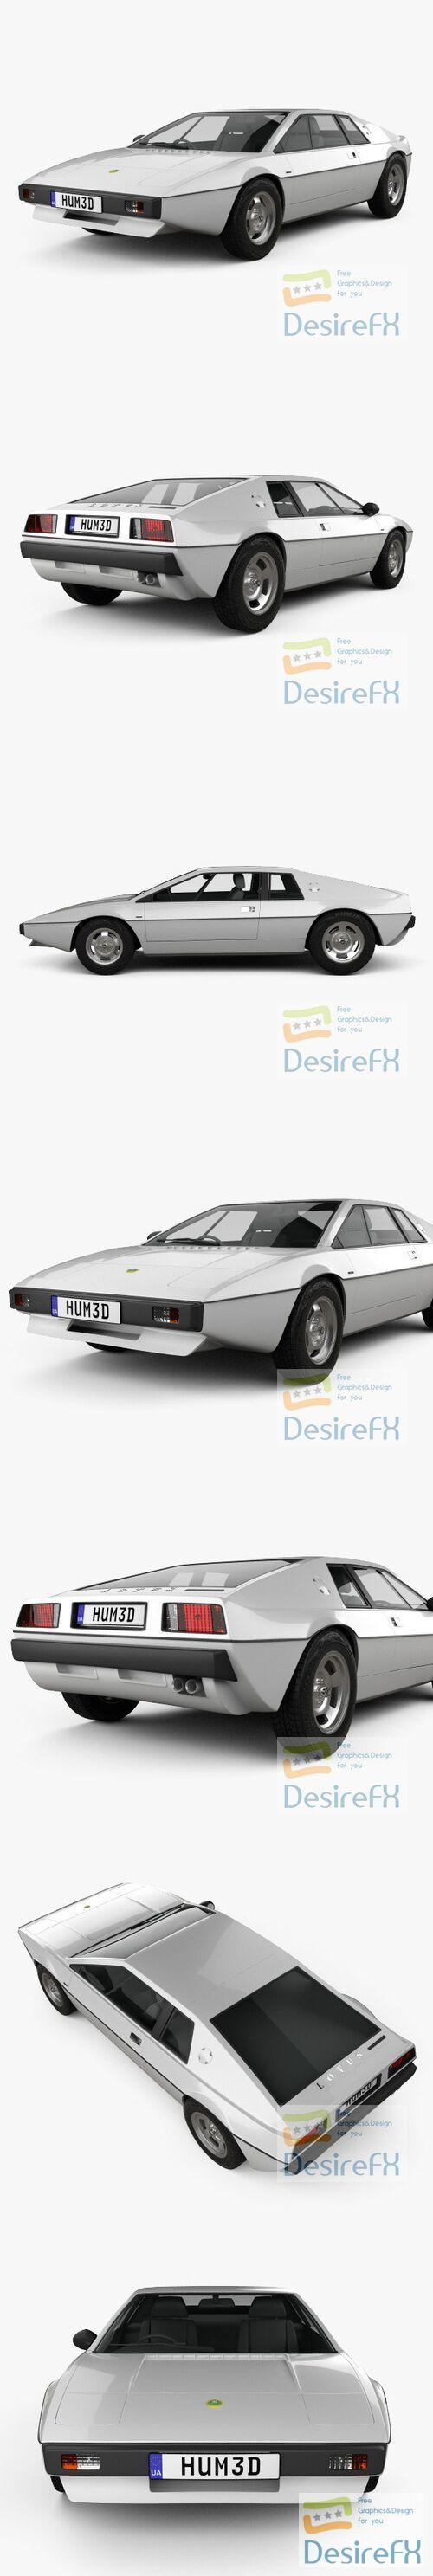 Lotus Esprit S1 1976 3D Model